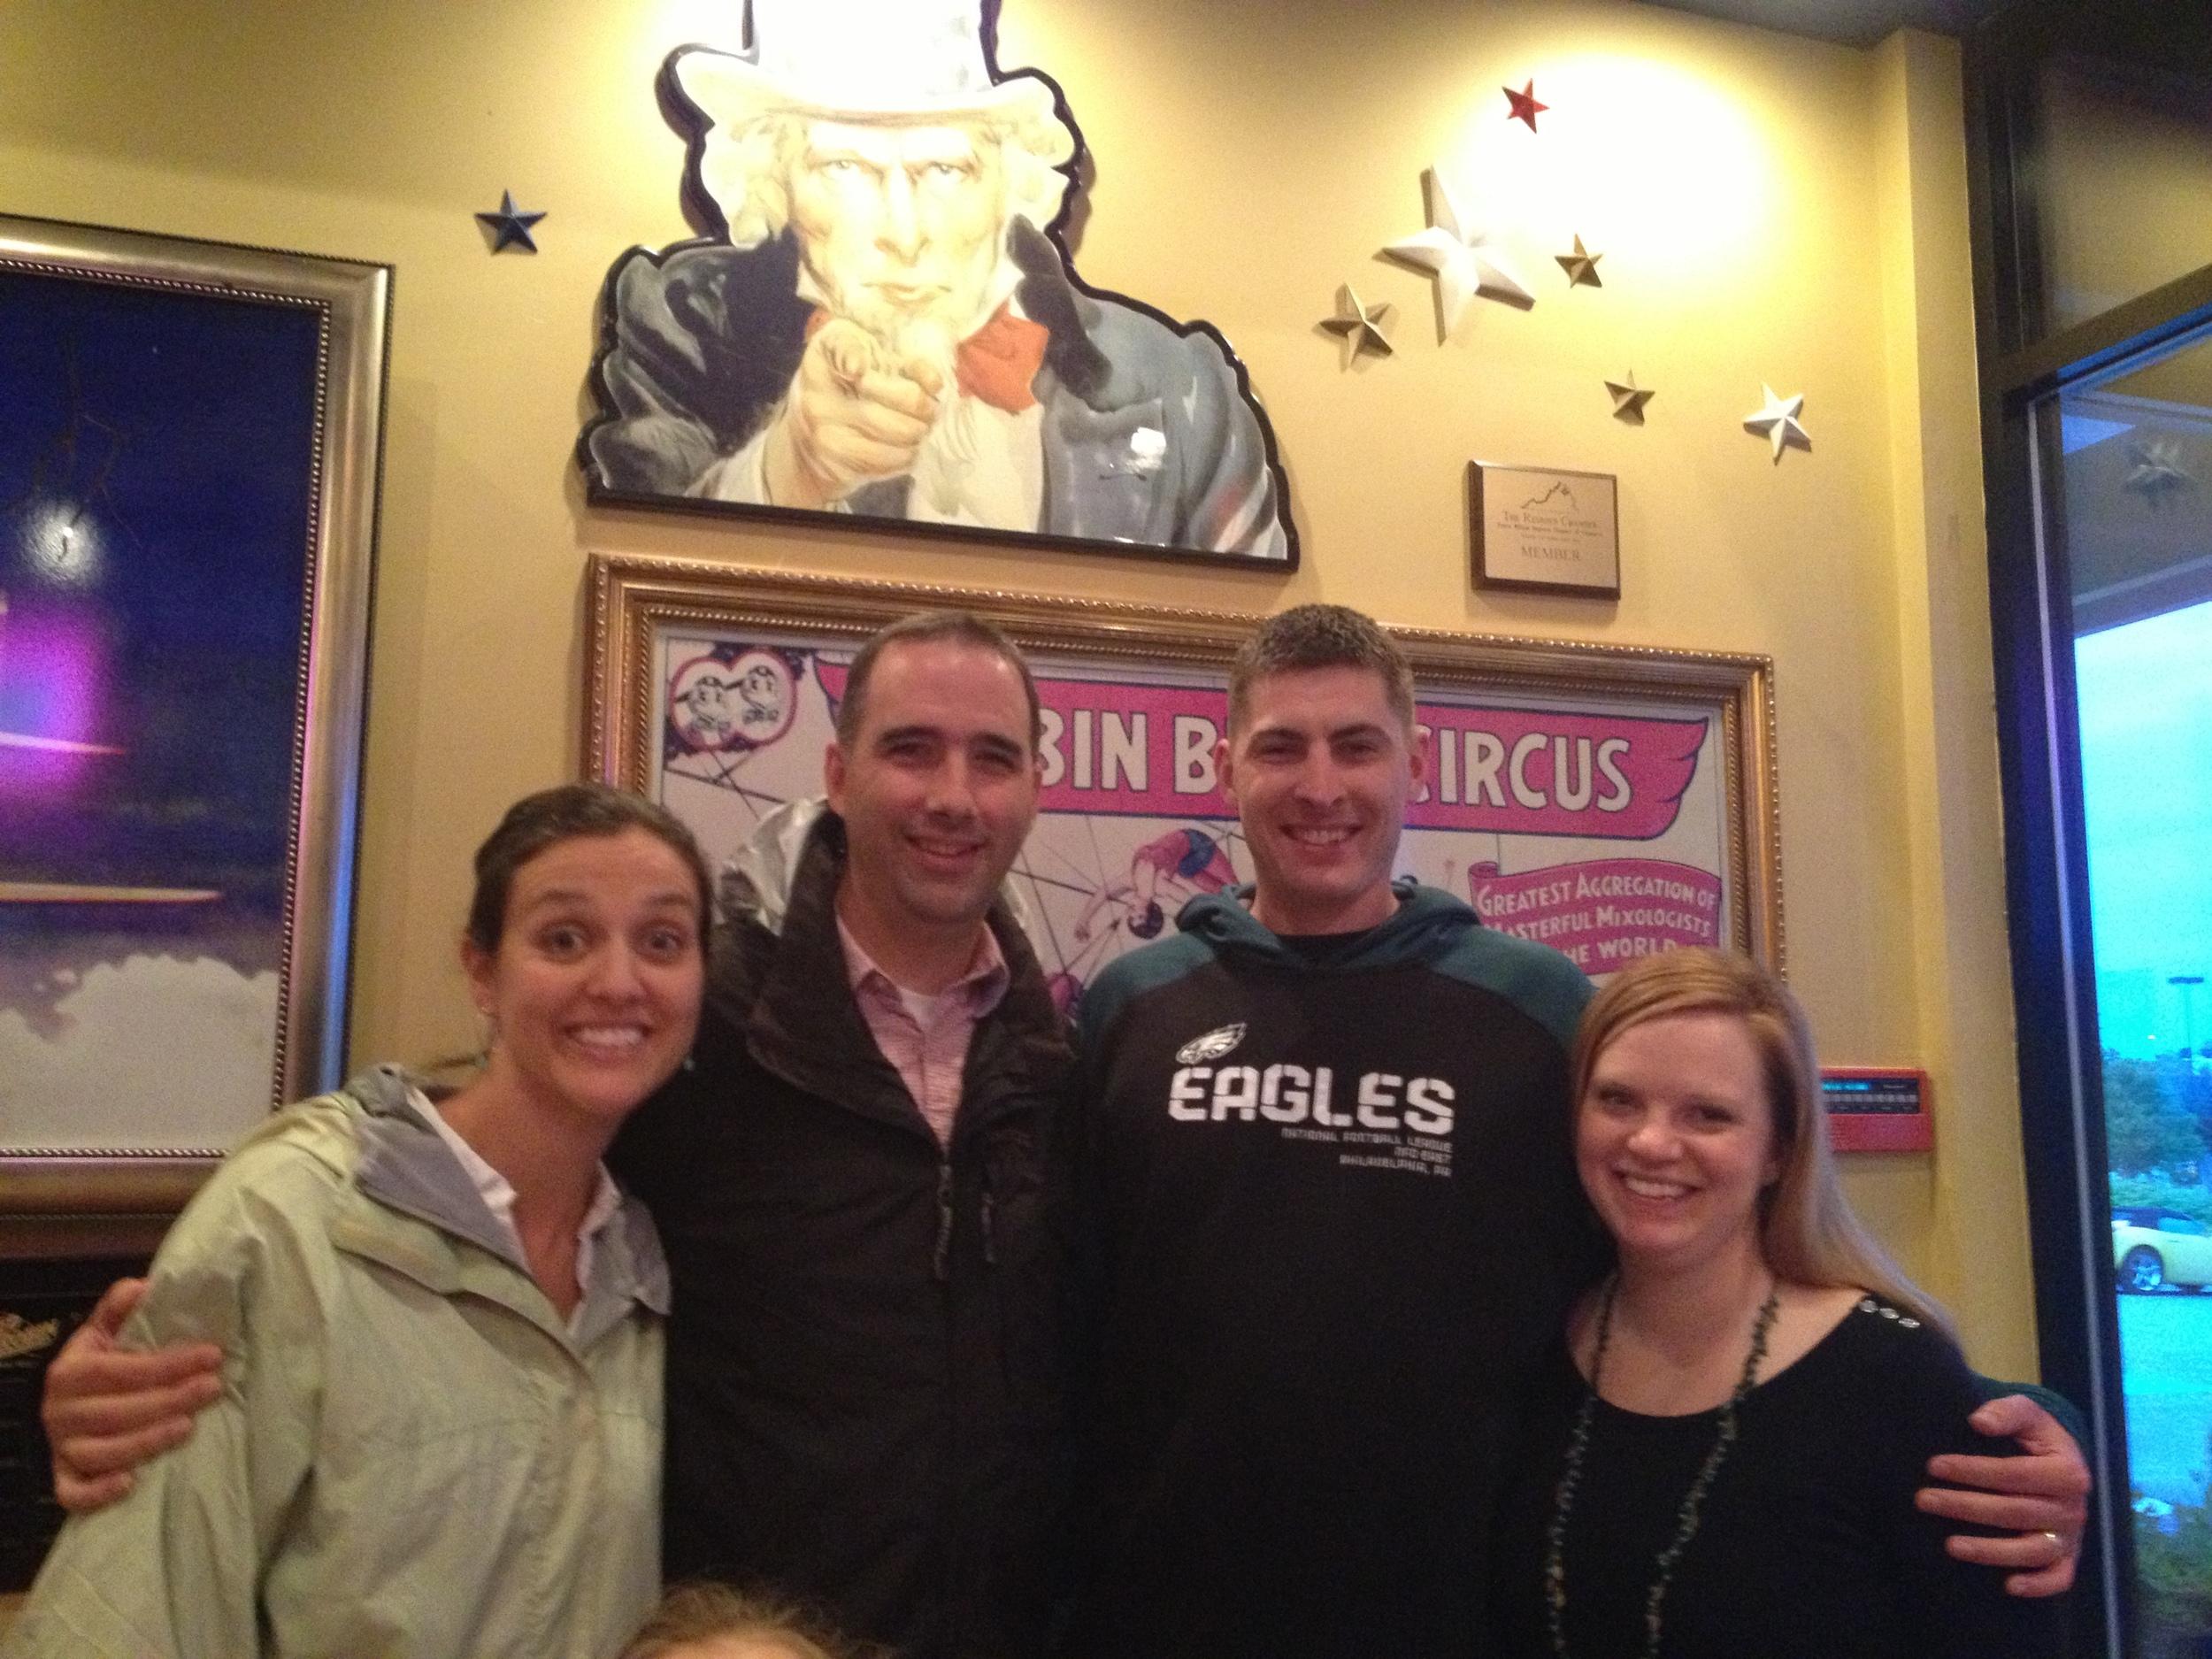 Visiting John and Danielle Tigue in Washington DC.